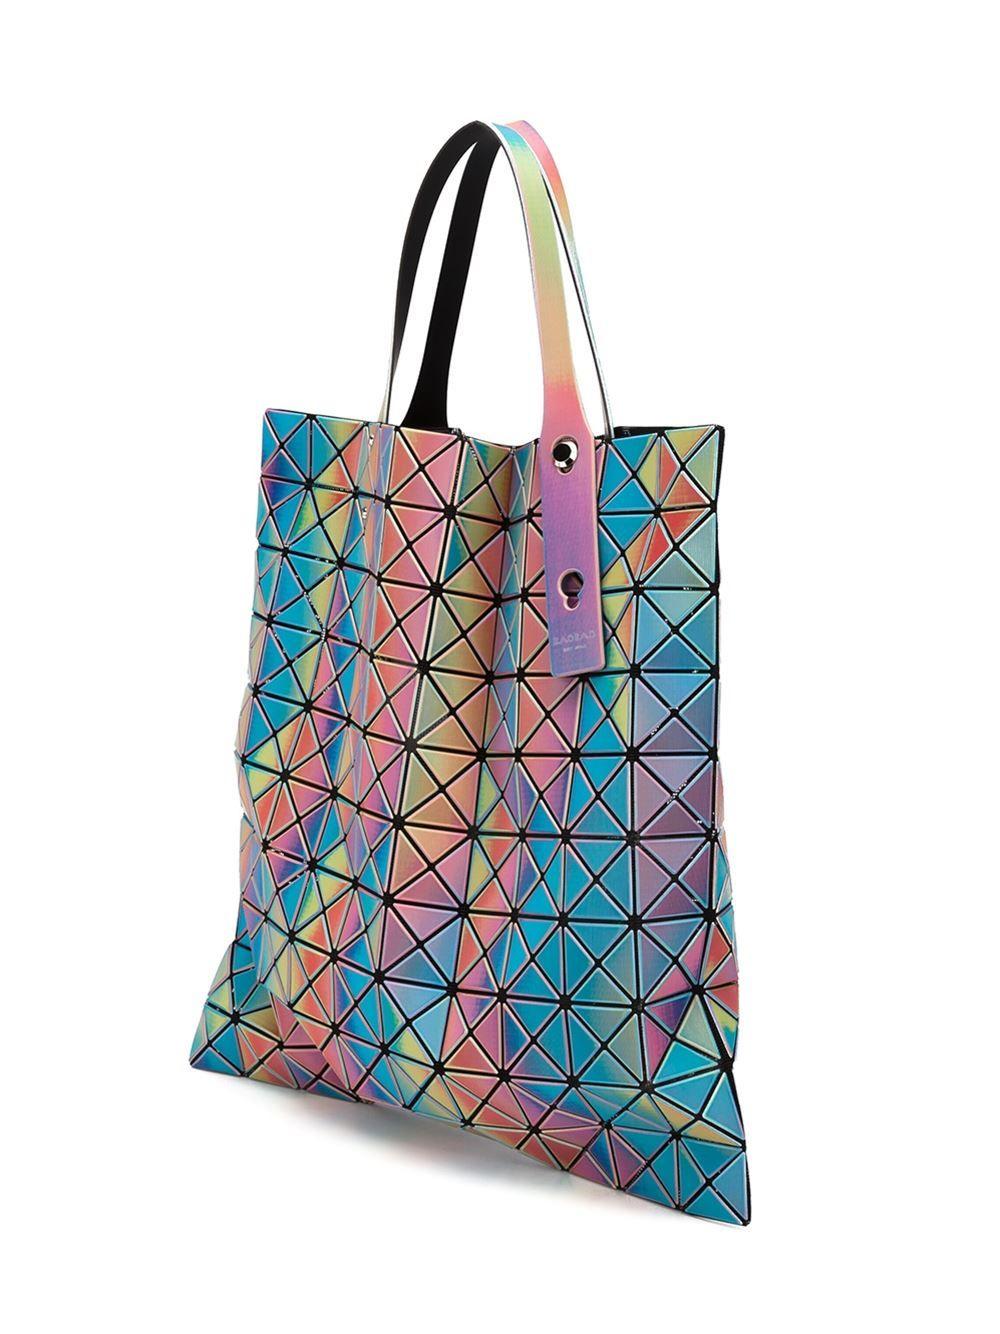 Bao Bao Issey Miyake rainbow prism tote  766   purses   Pinterest ... 1660a13867